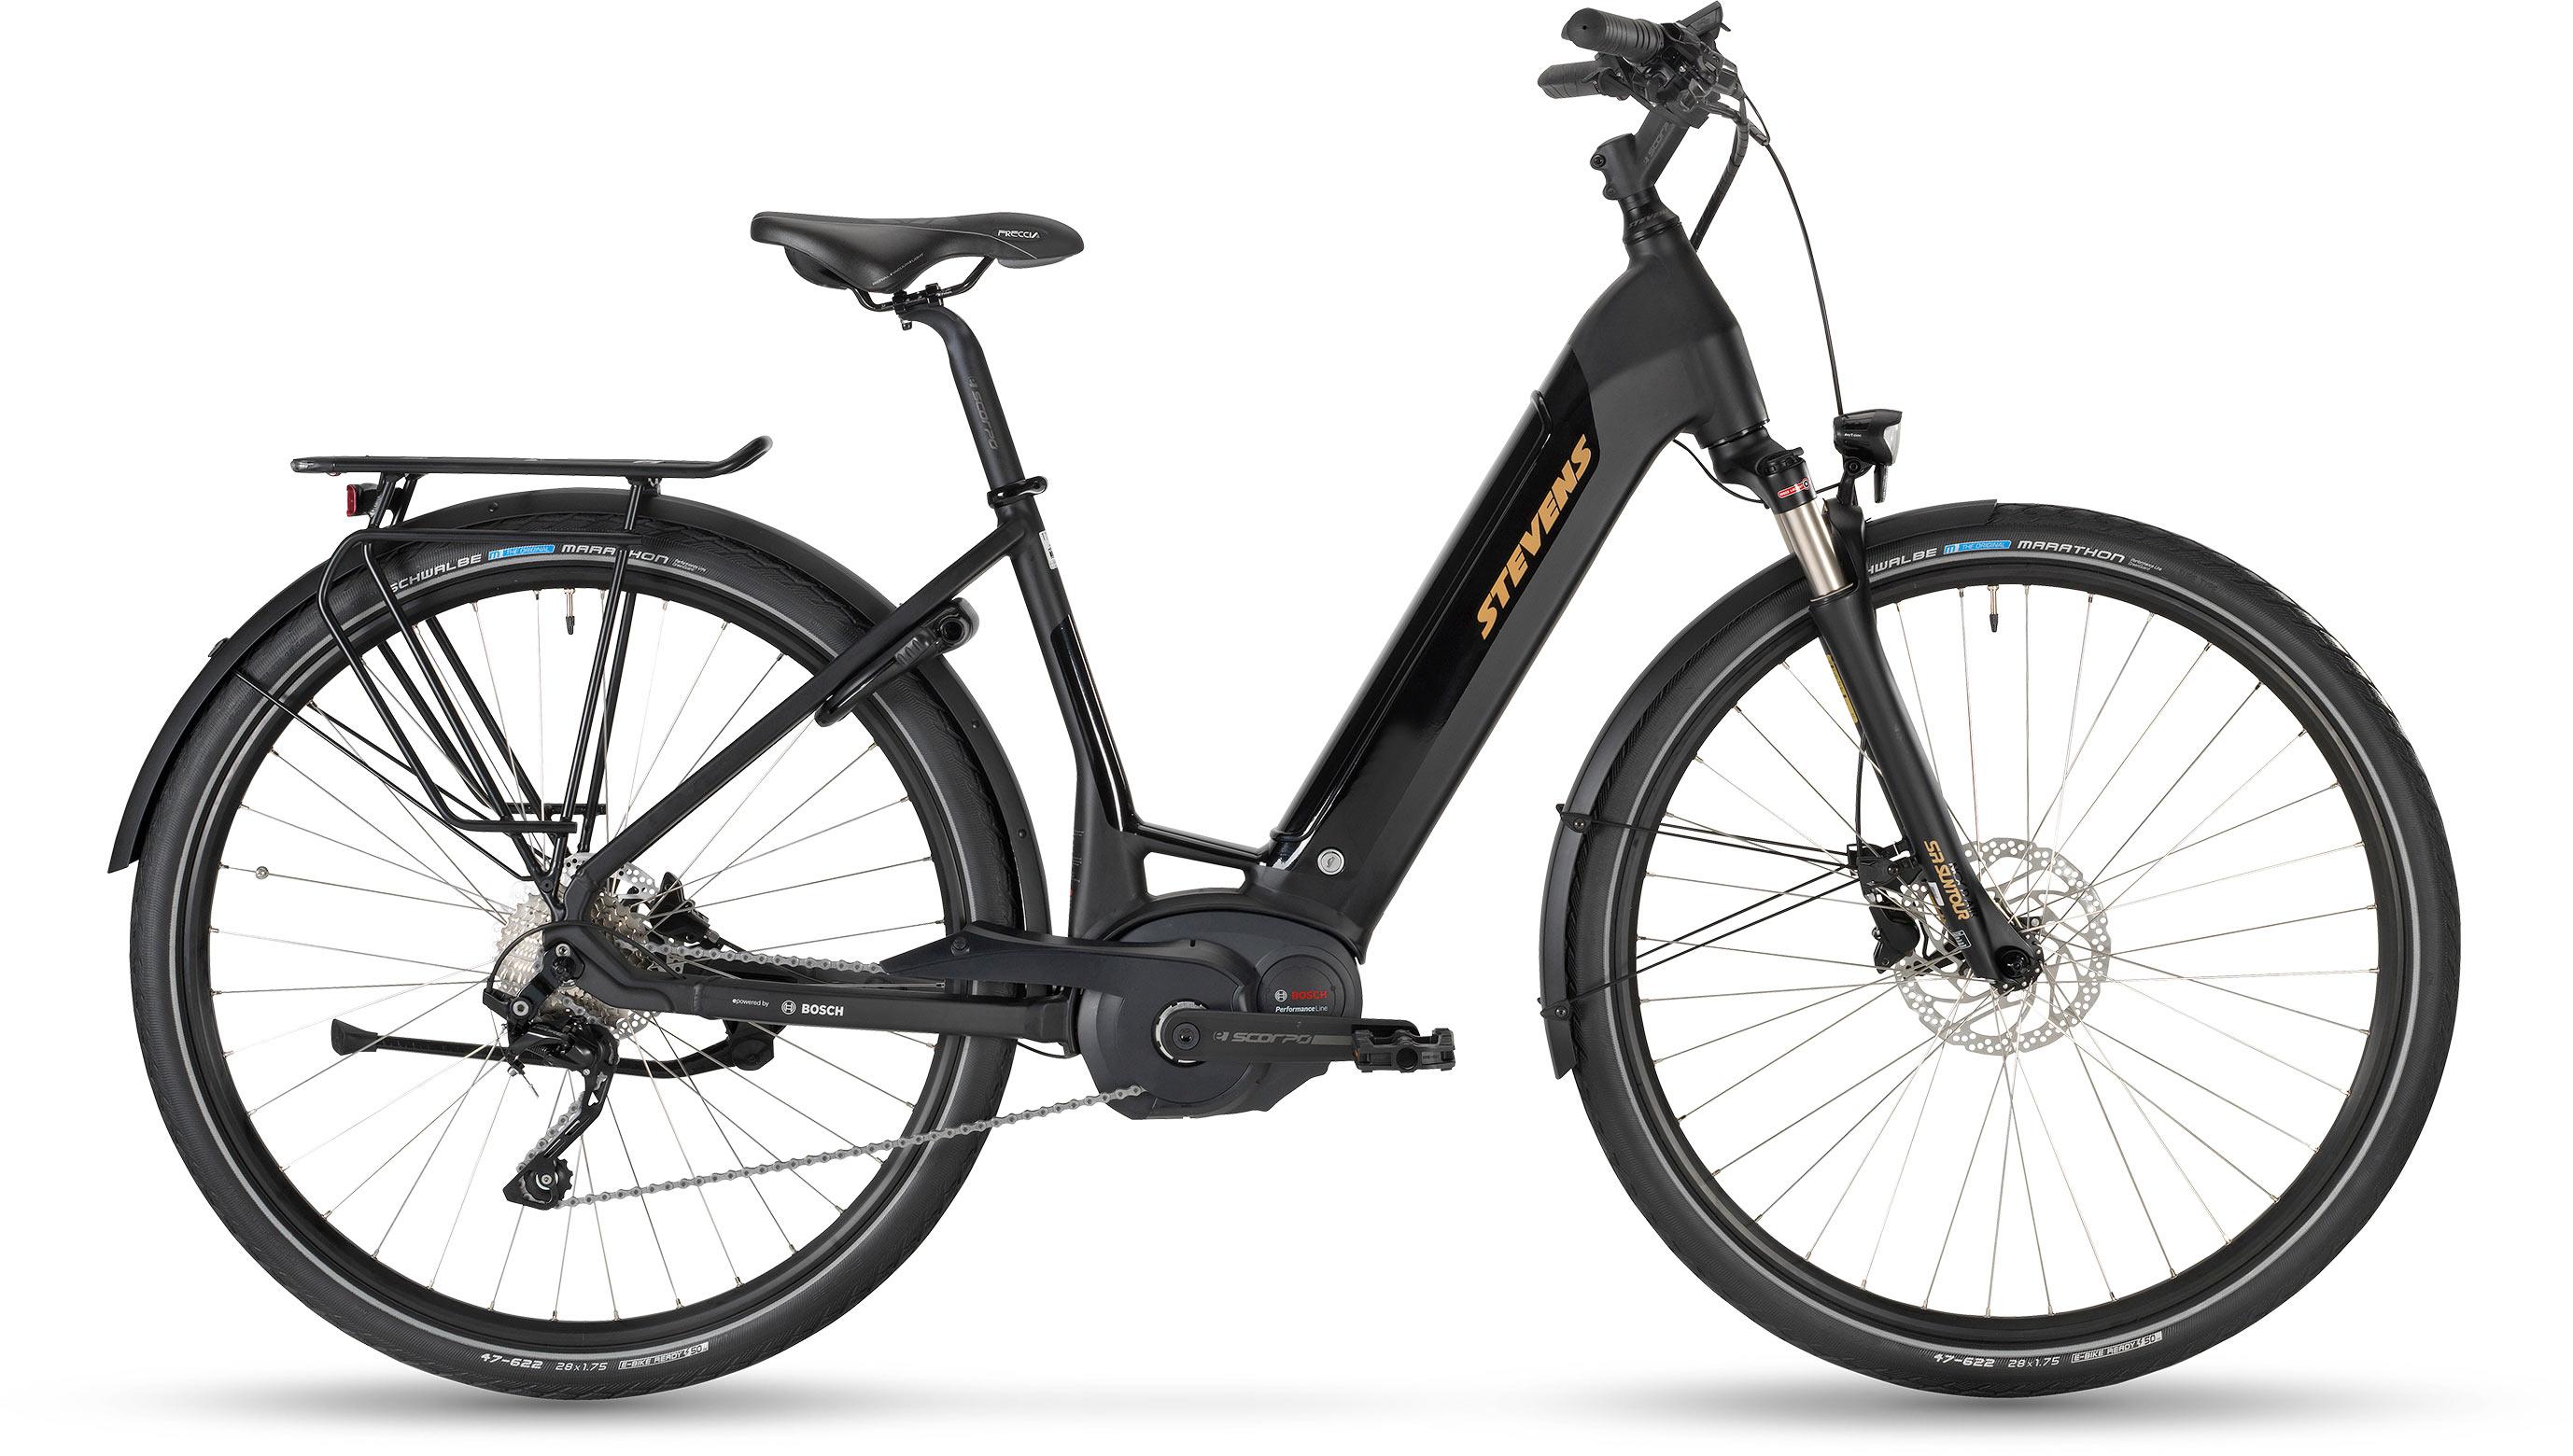 stevens fietsen stevens elektrische fietsen smartwheels. Black Bedroom Furniture Sets. Home Design Ideas